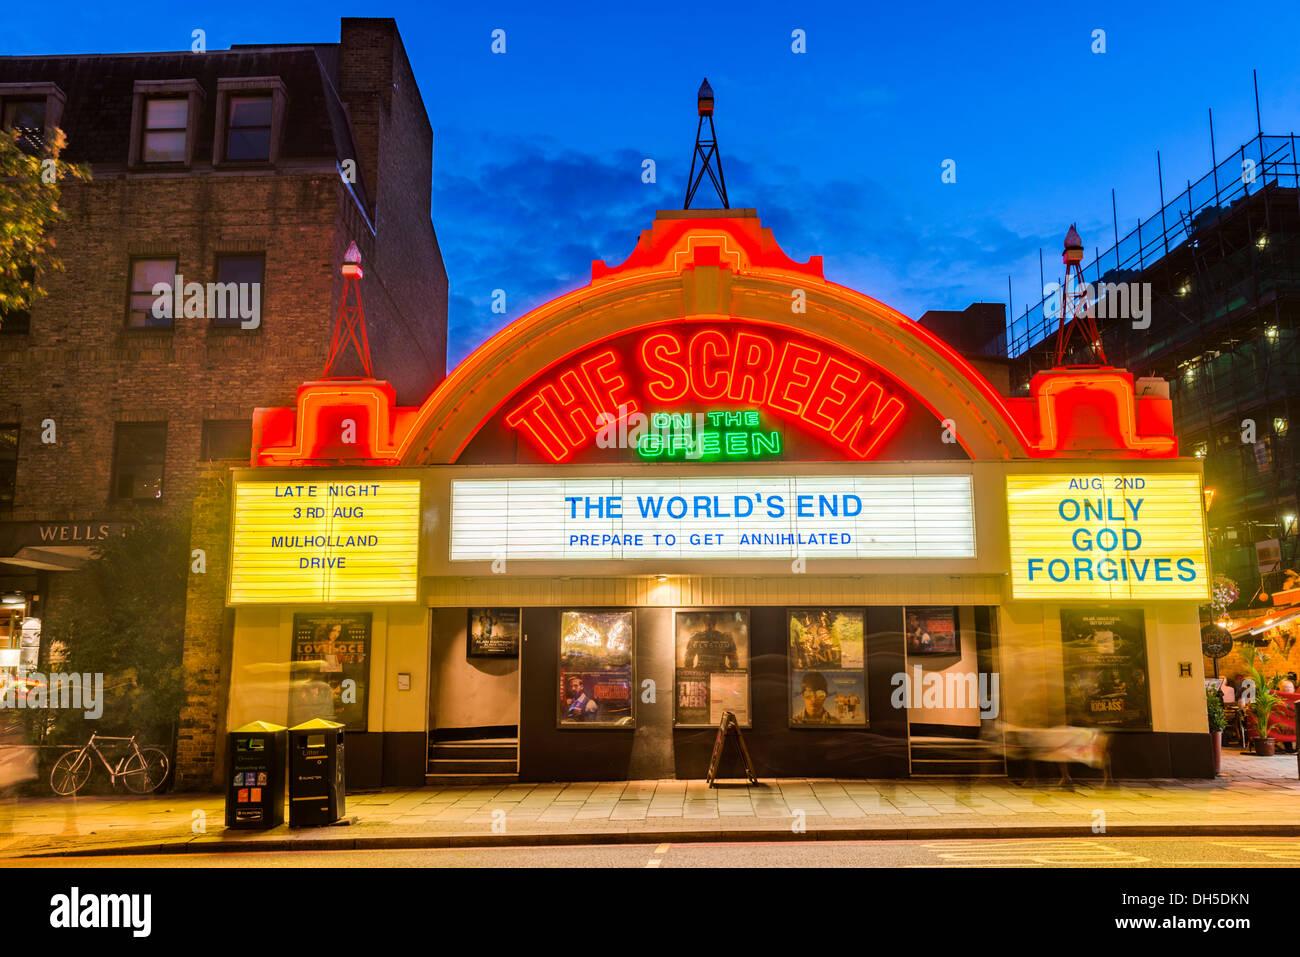 Der Bildschirm auf den grünen Kino in der Nacht, Upper Street, Islington, London, England, UK Stockbild